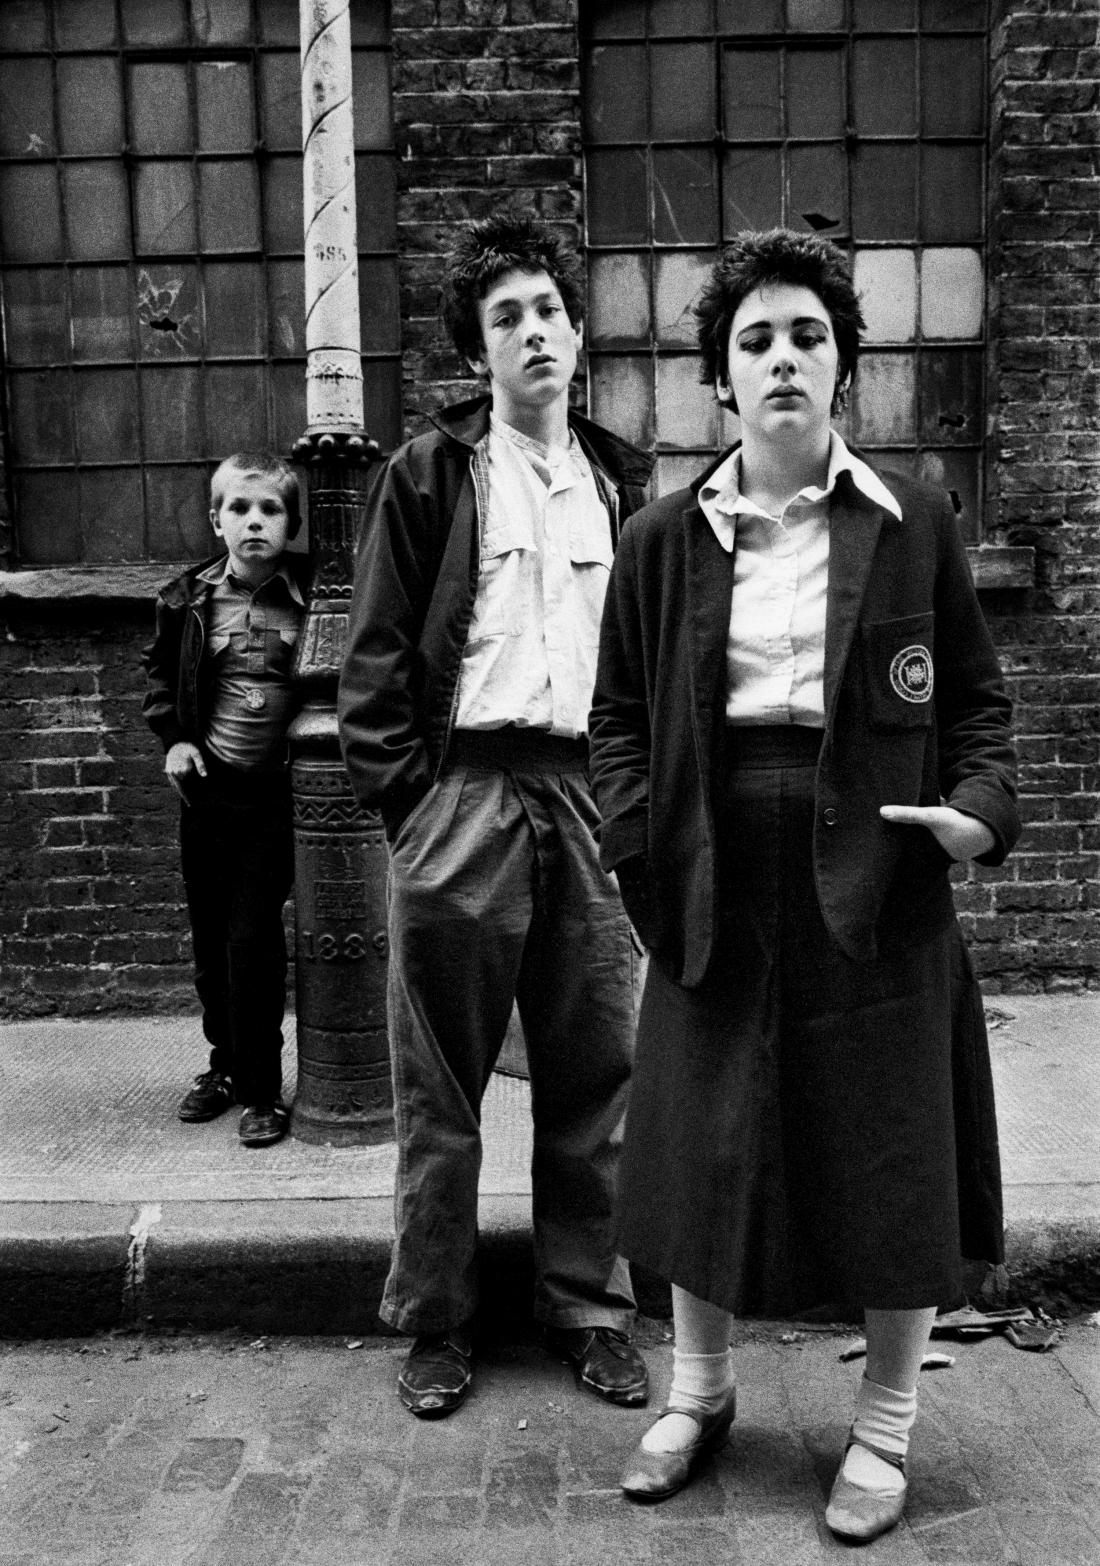 RAR fans Paul Duncan and Lucy Tilney, Bethnal Green, East London 1978